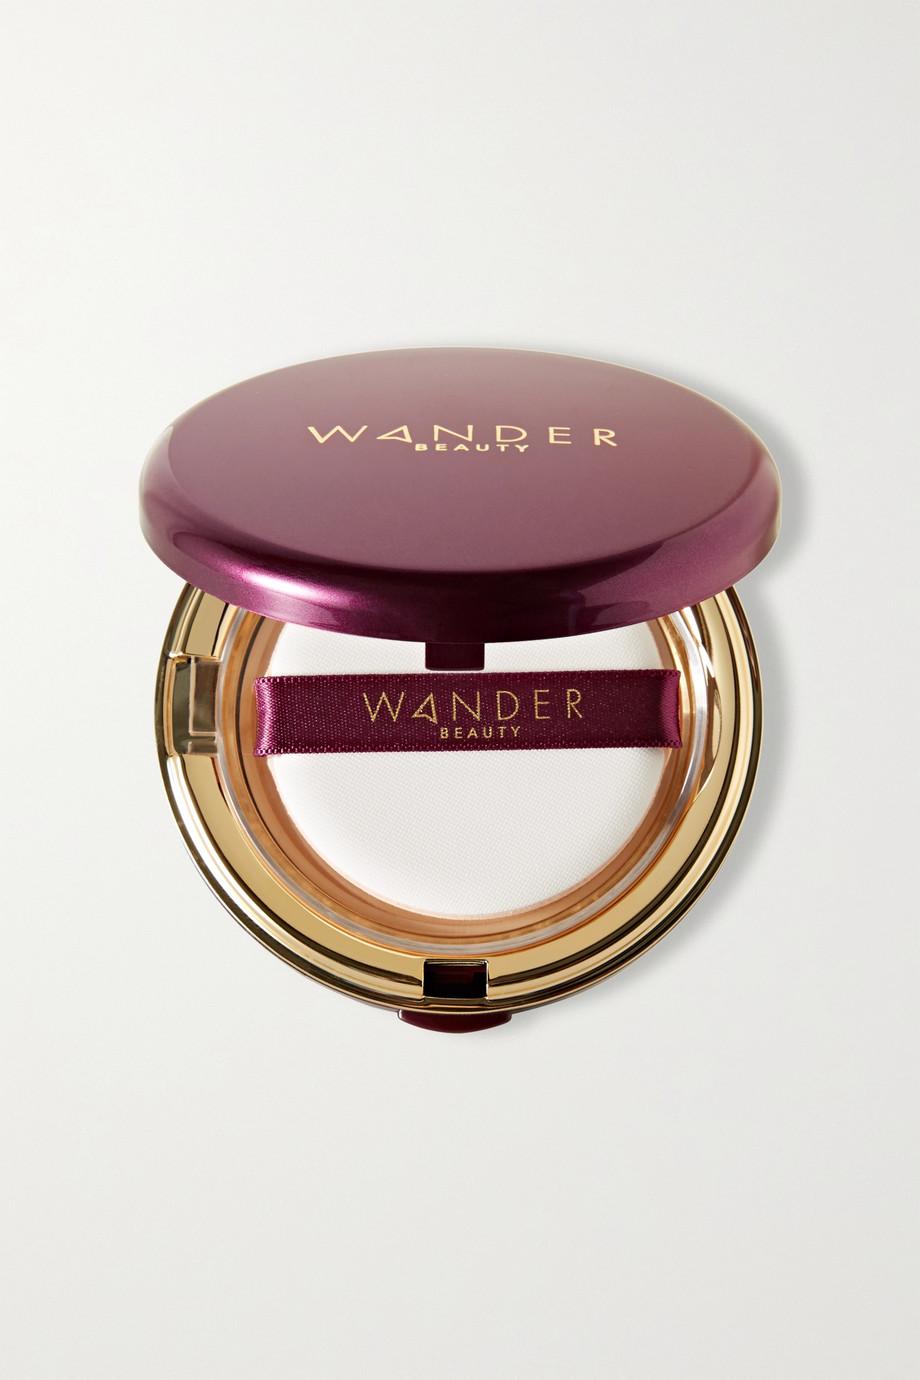 Wander Beauty Wanderlust Powder Foundation - Fair